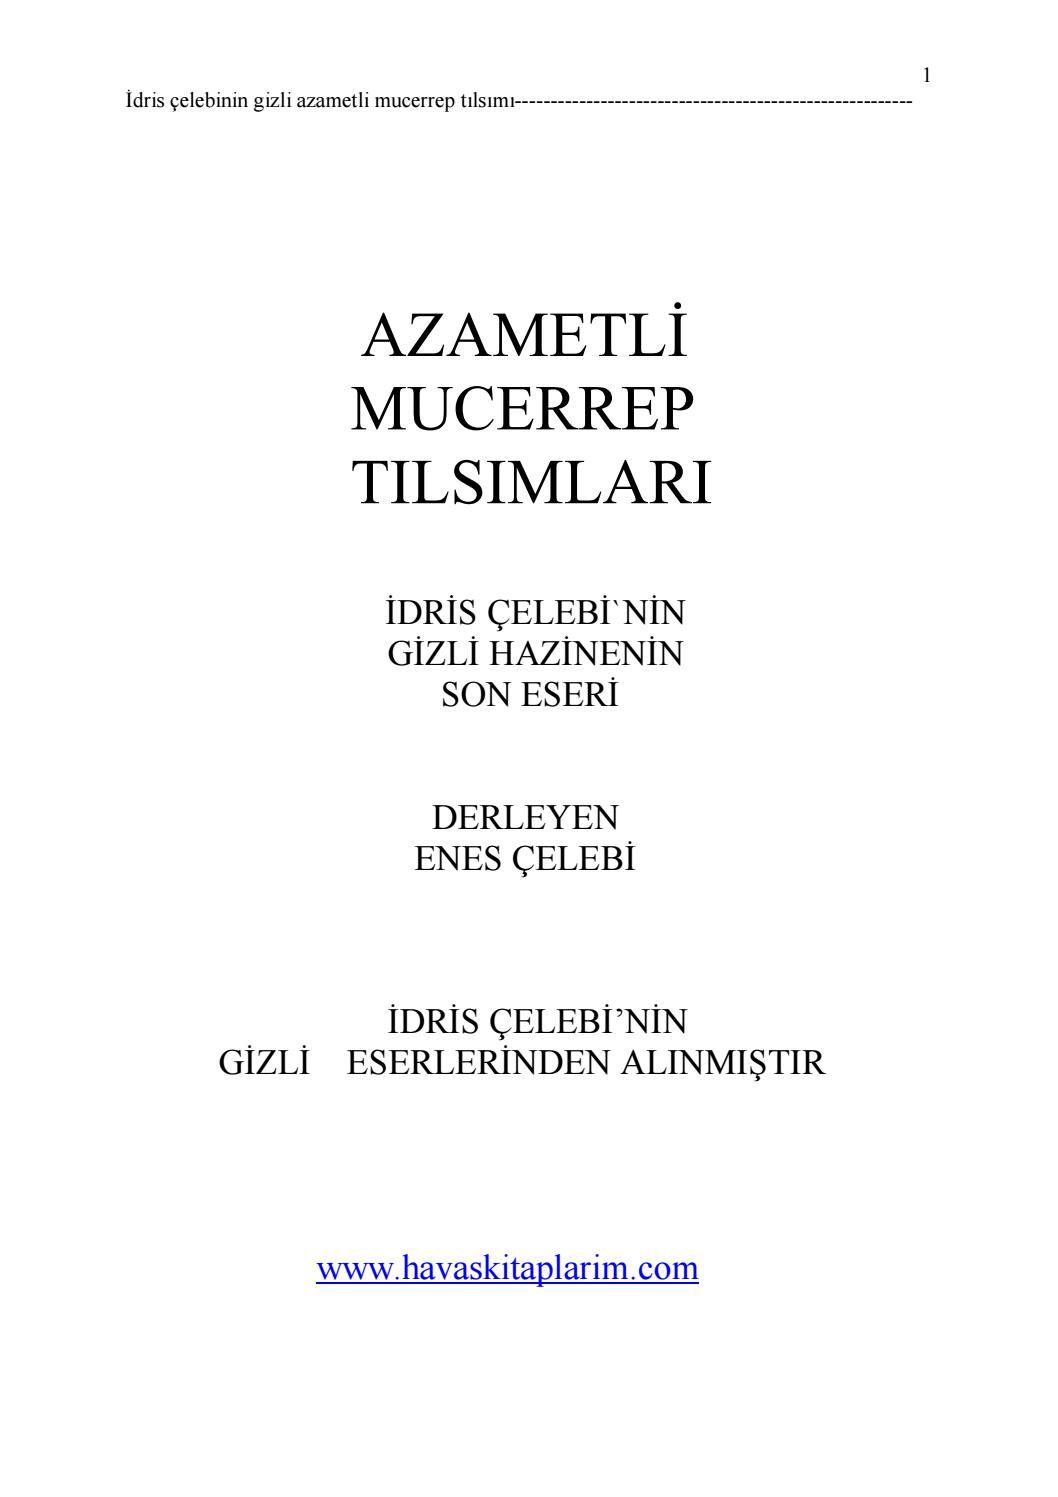 24 Azametli Mucerrep Tilsimlari 348 Sayfa By Ismail Kara Issuu